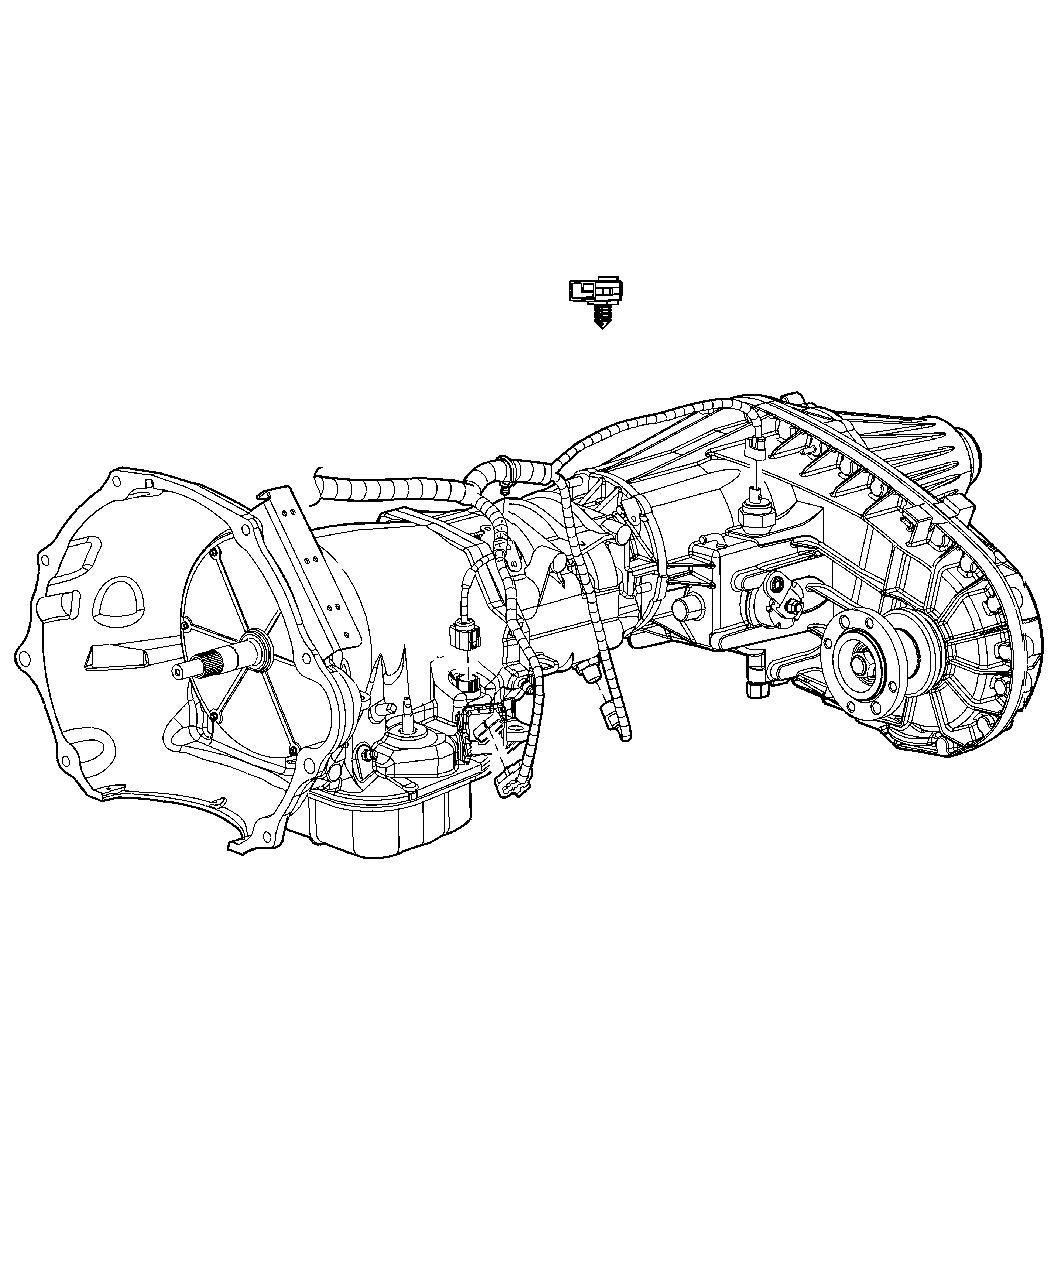 Dodge Ram Wiring Transmission Elec Shift On The Fly Transfer Case